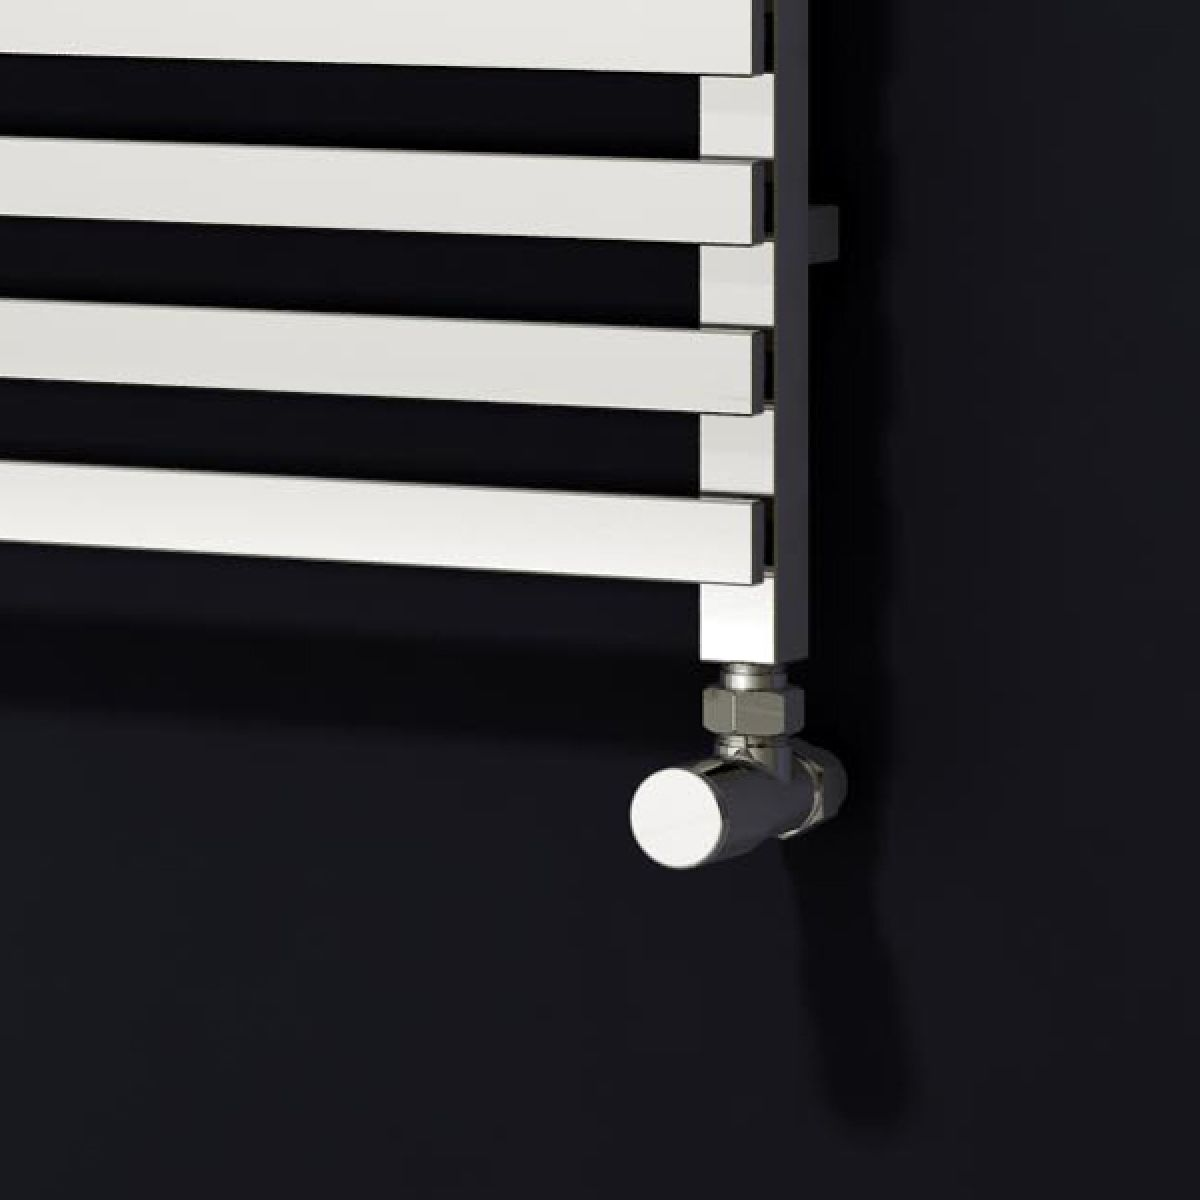 Carina Designer Chrome Electric Towel Rail 1200 x 500mm Detail